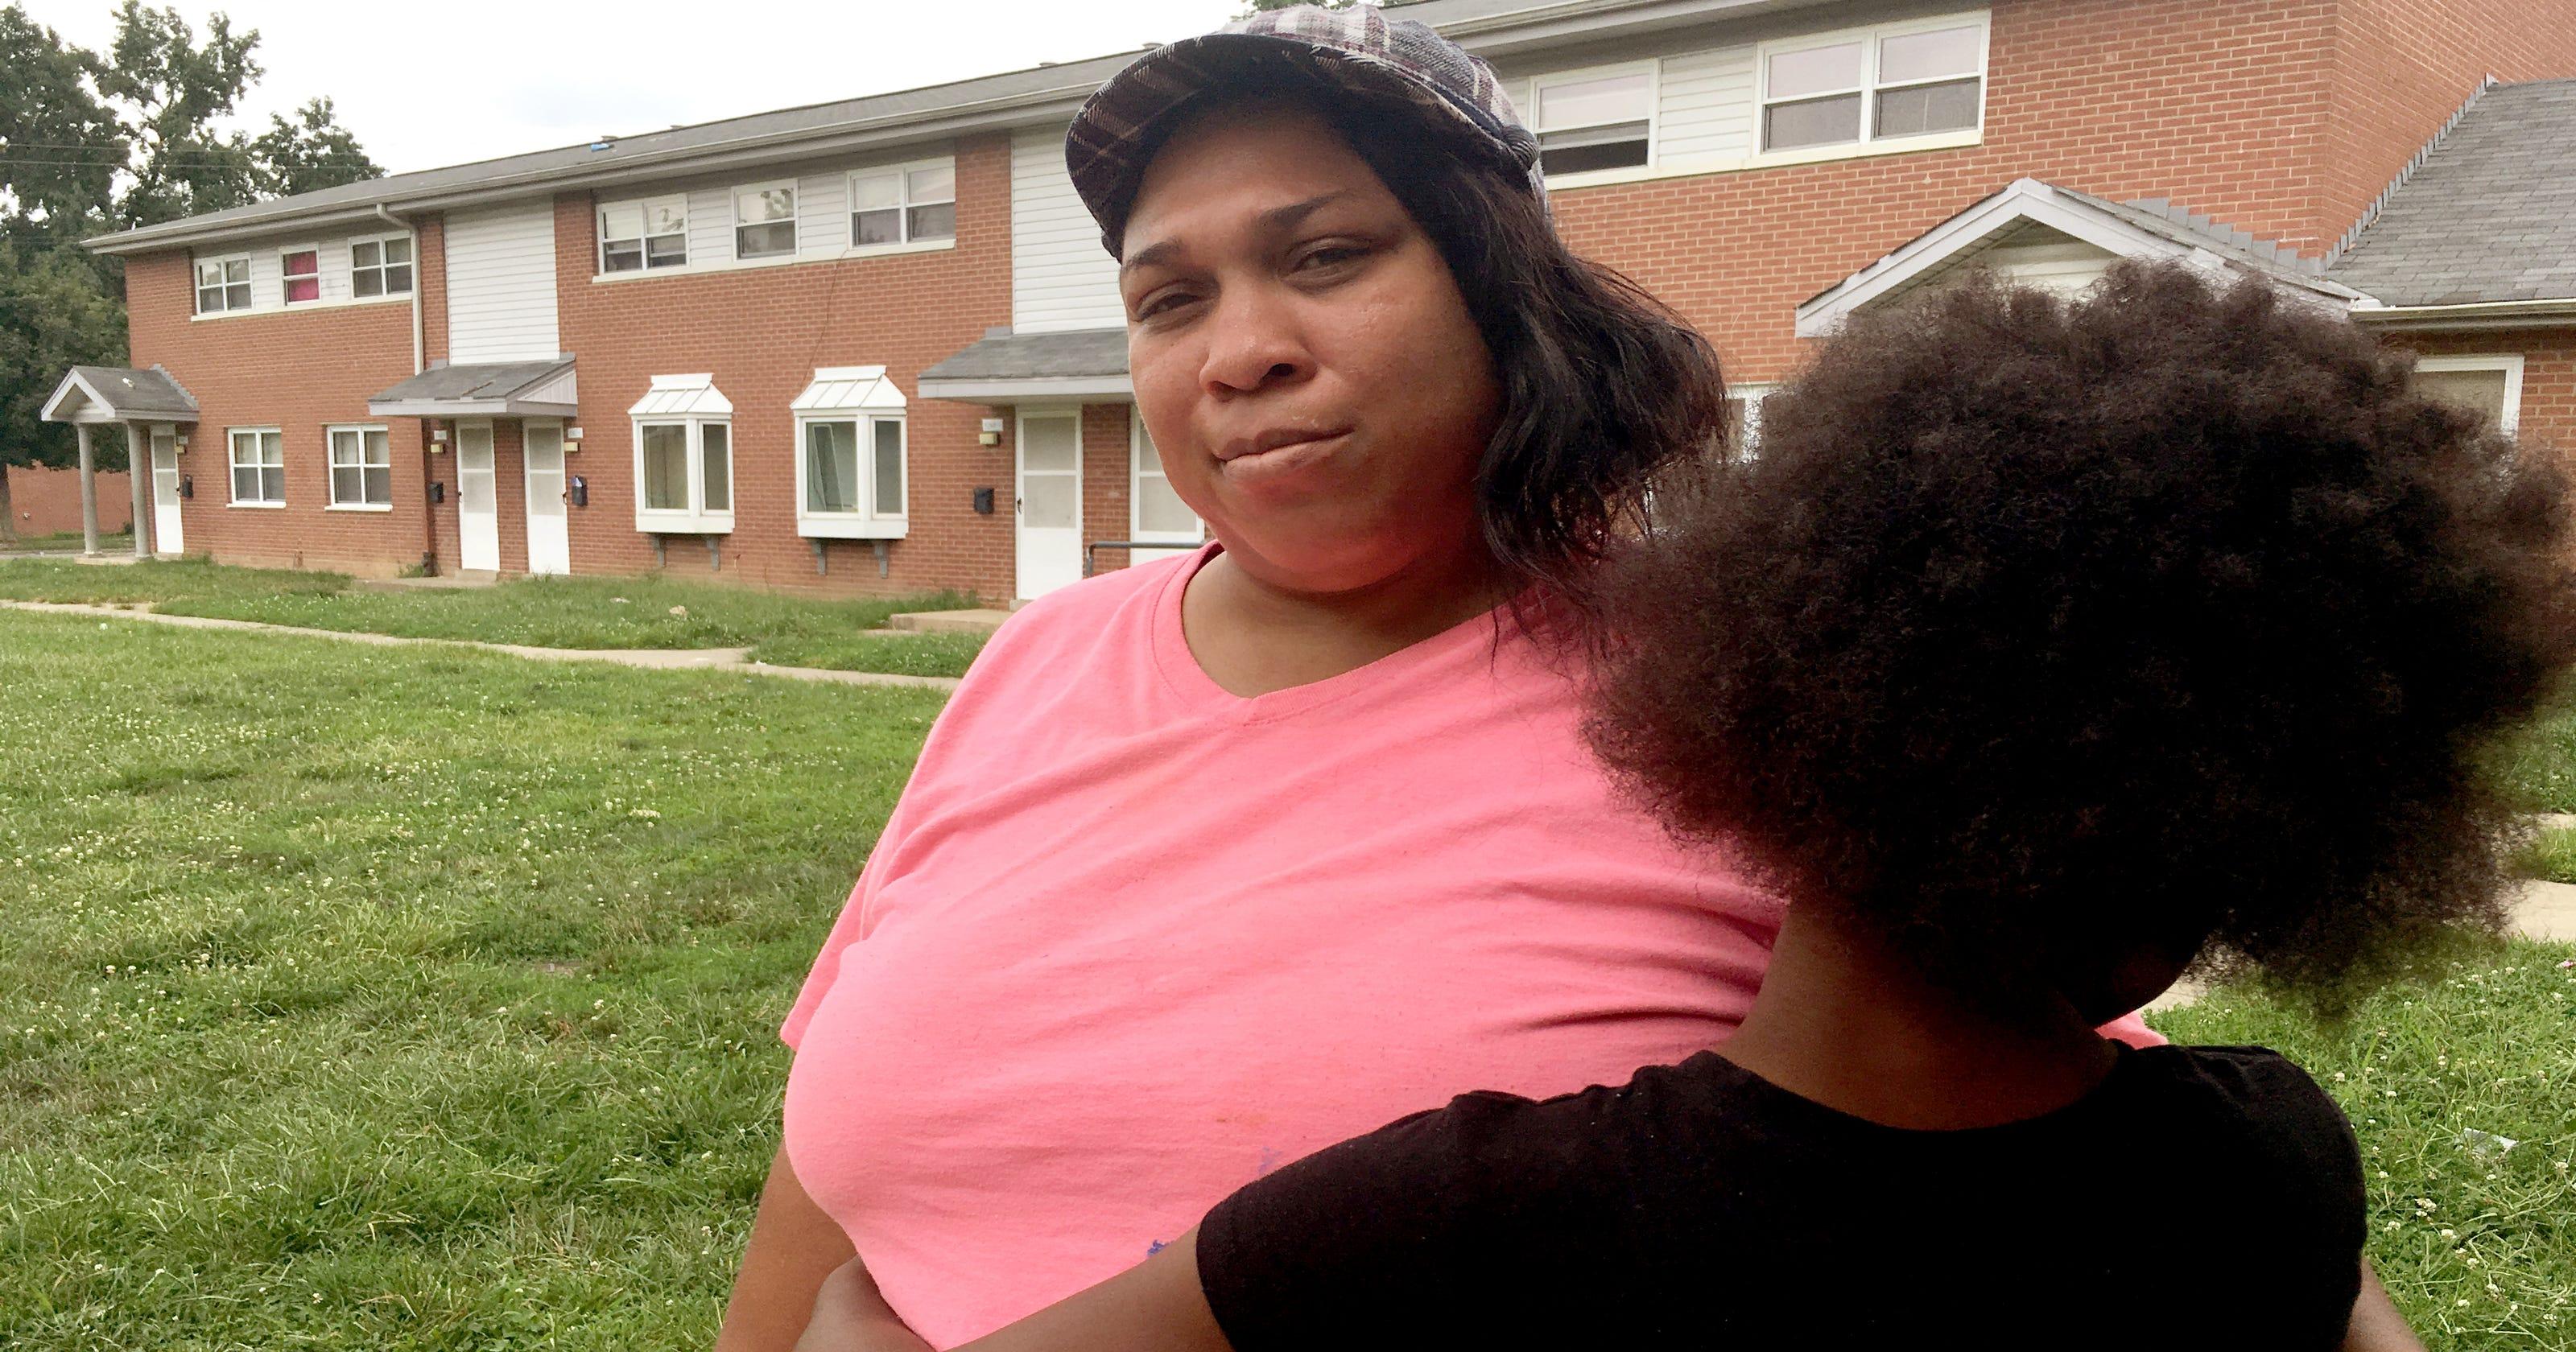 Taser: Cincinnati police officer stunned 11-year-old girl at